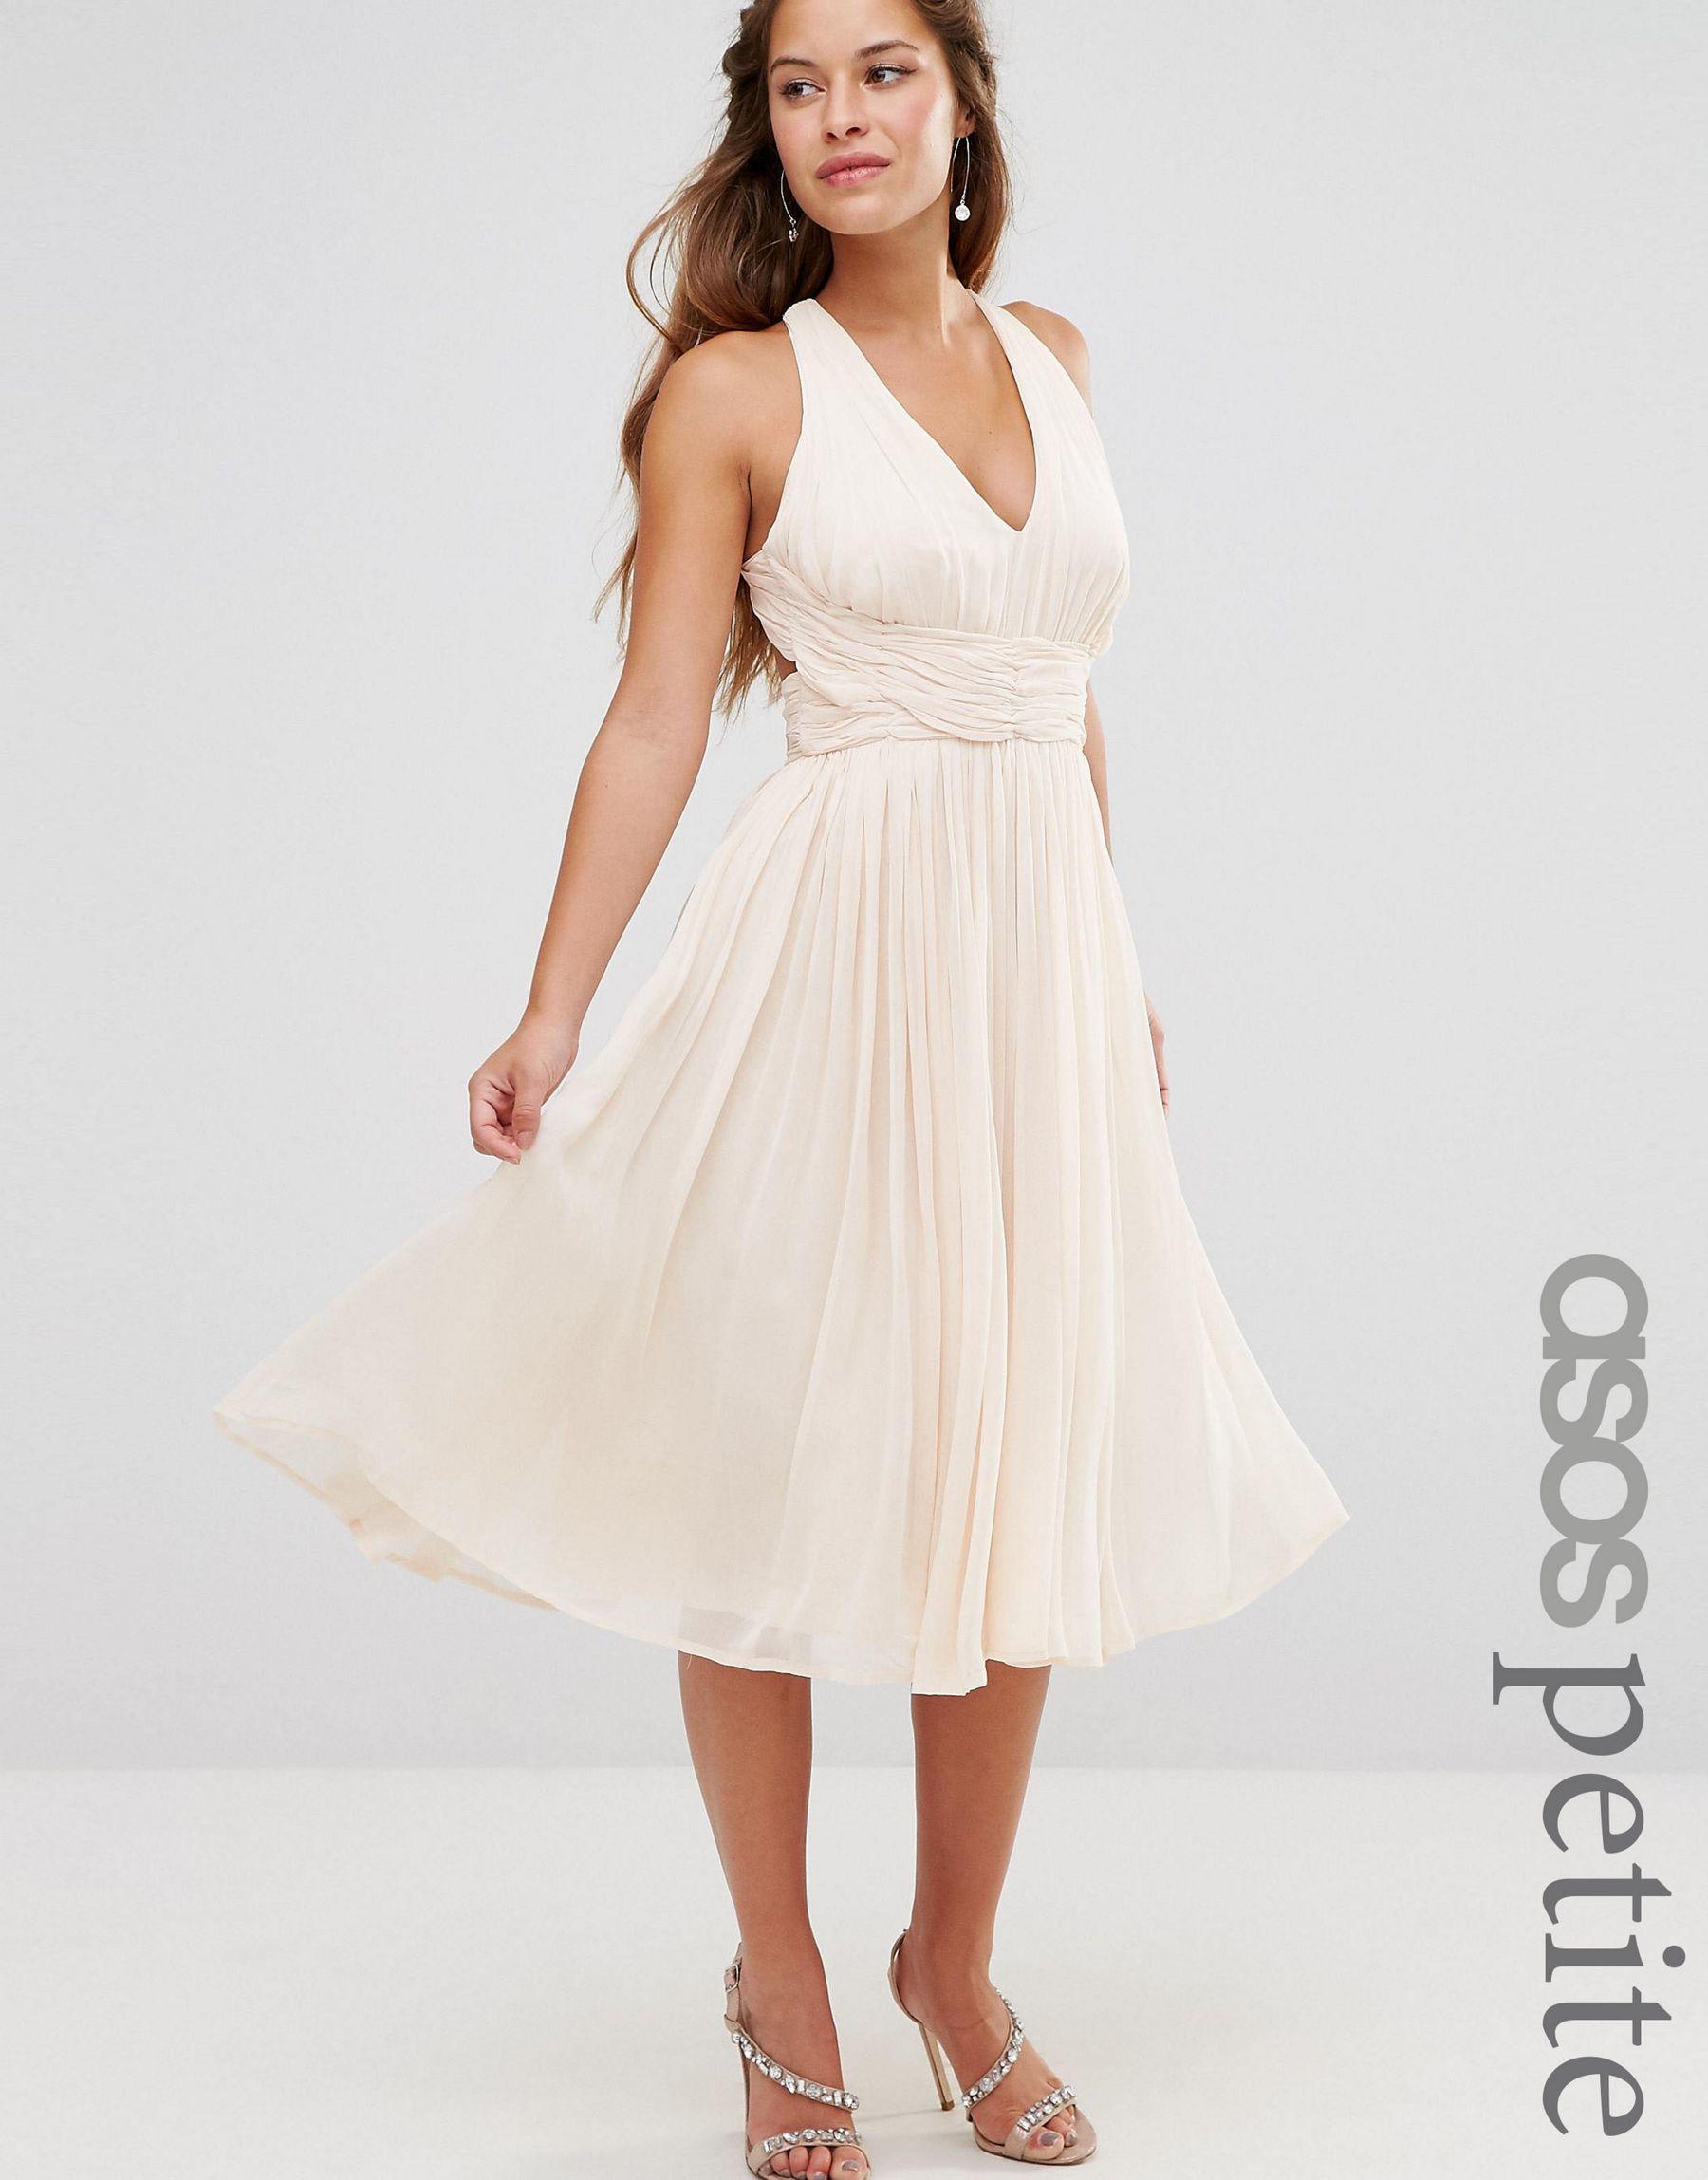 07081a41c9e Lyst - Asos Petite Wedding Hollywood Midi Dress